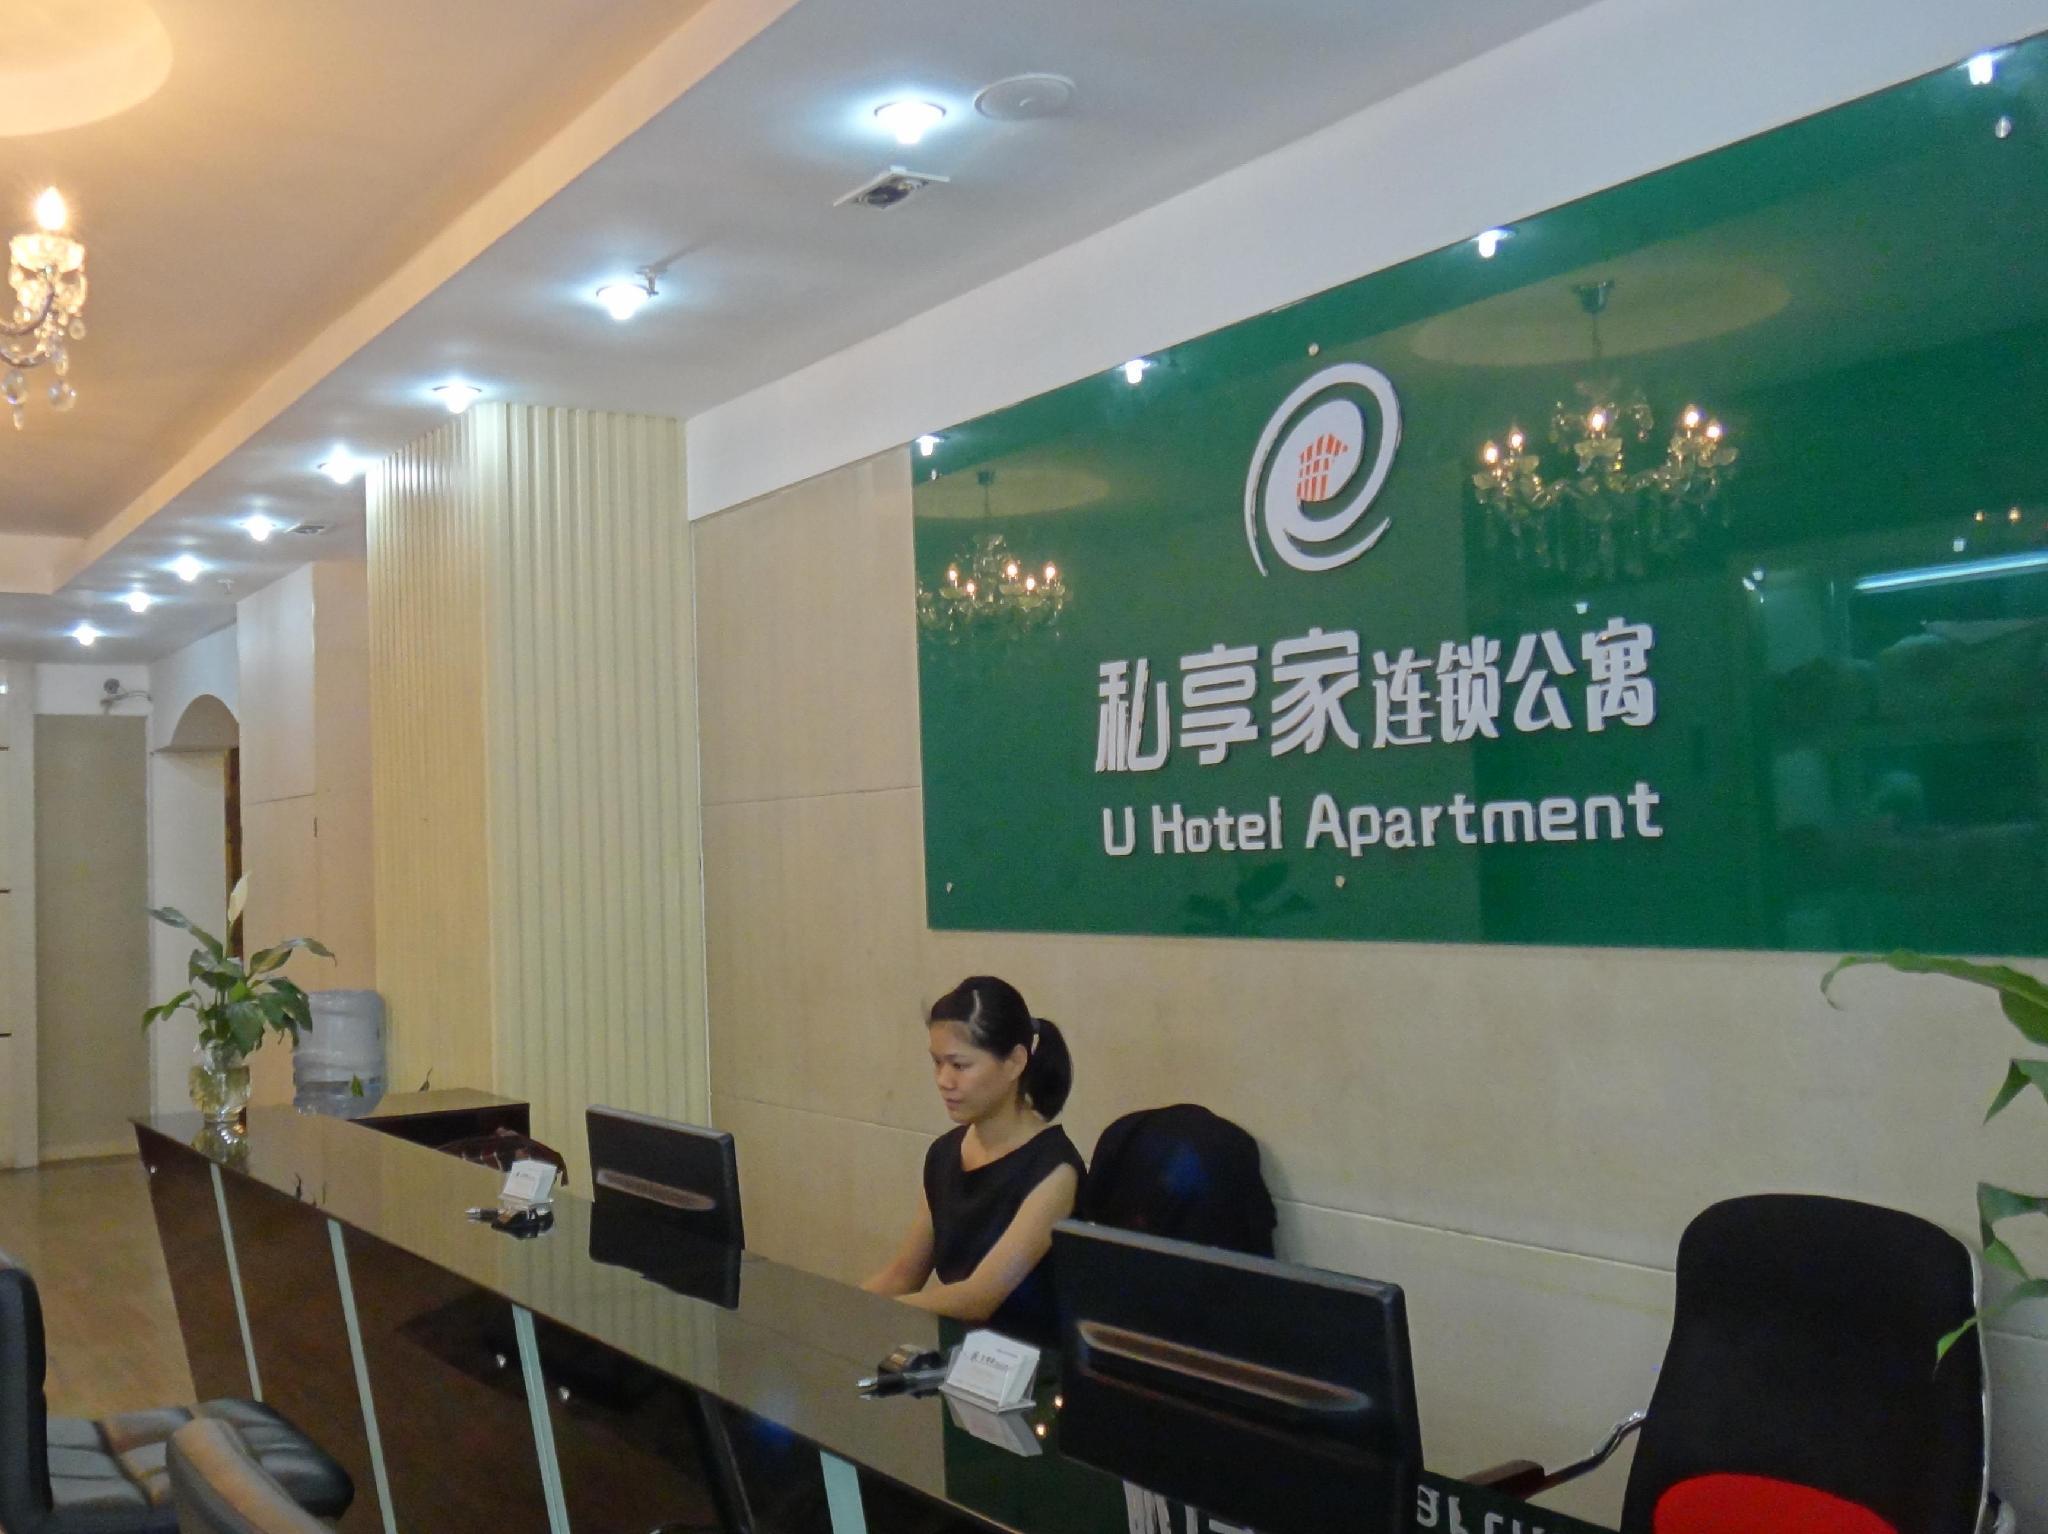 U Hotel South Pear SOHO Apartment - Guangzhou